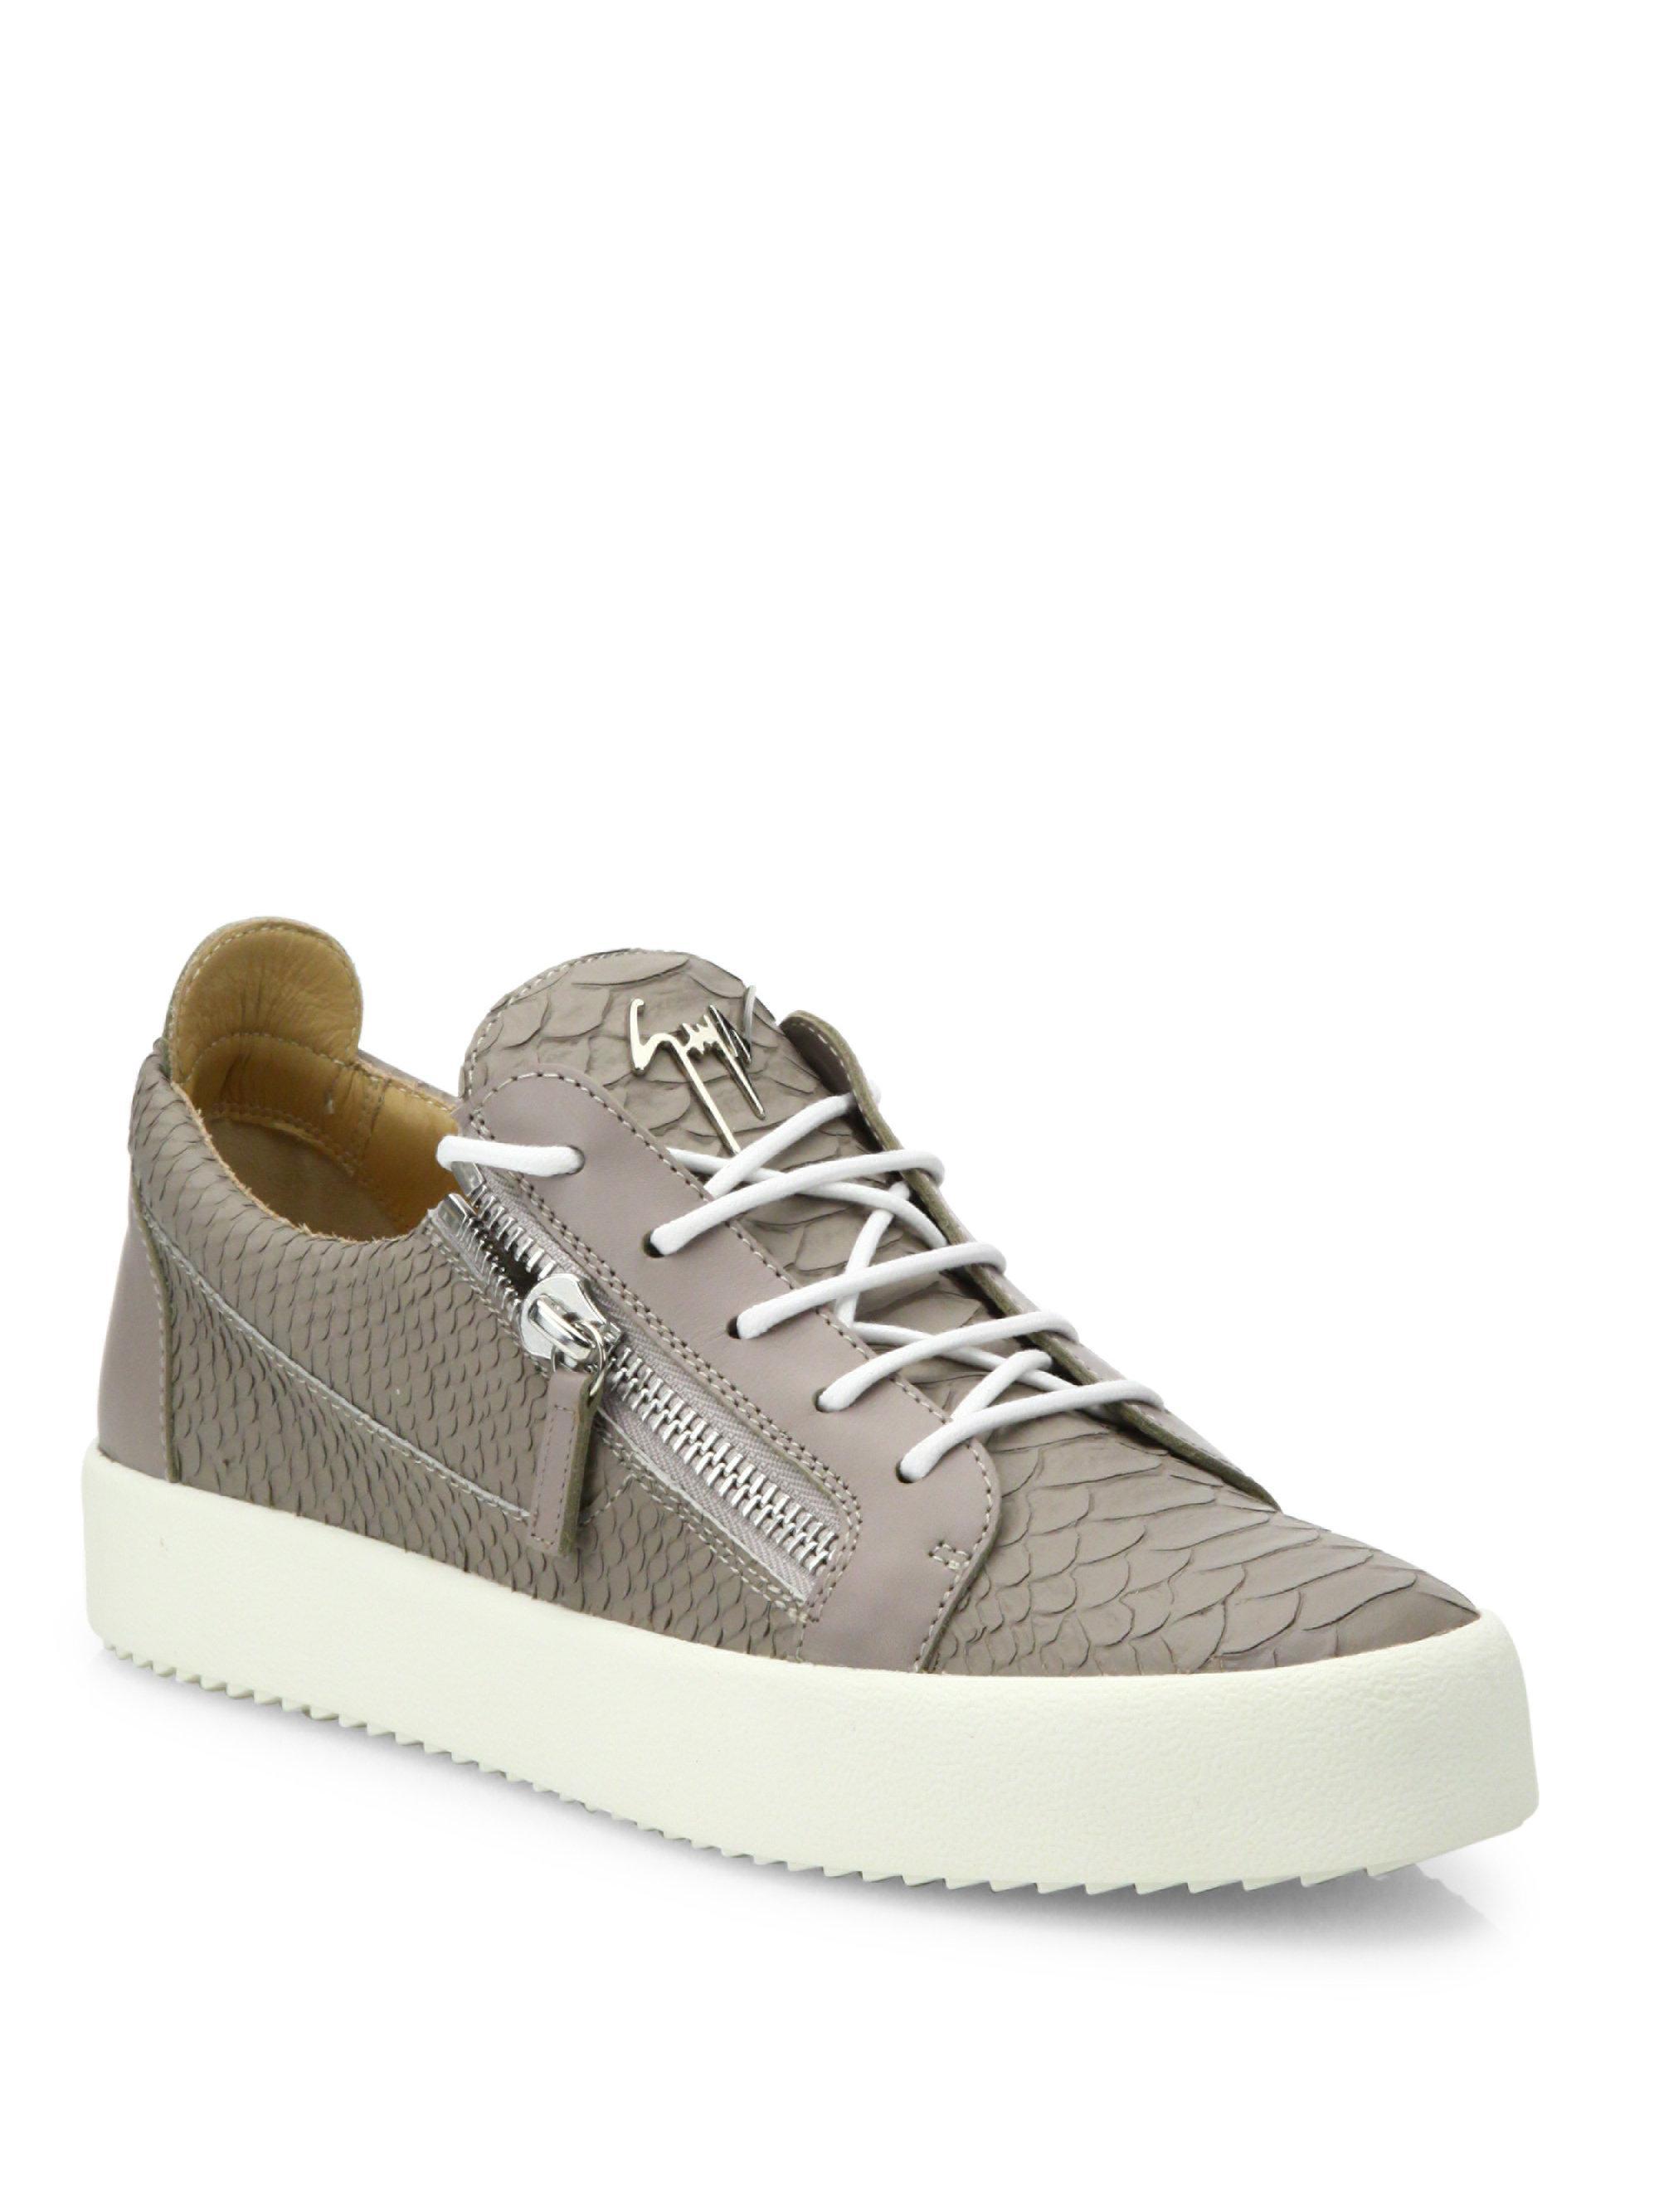 Giuseppe Zanotti Embossed Leather Low-Top Sneakers NtGpqK1VxB